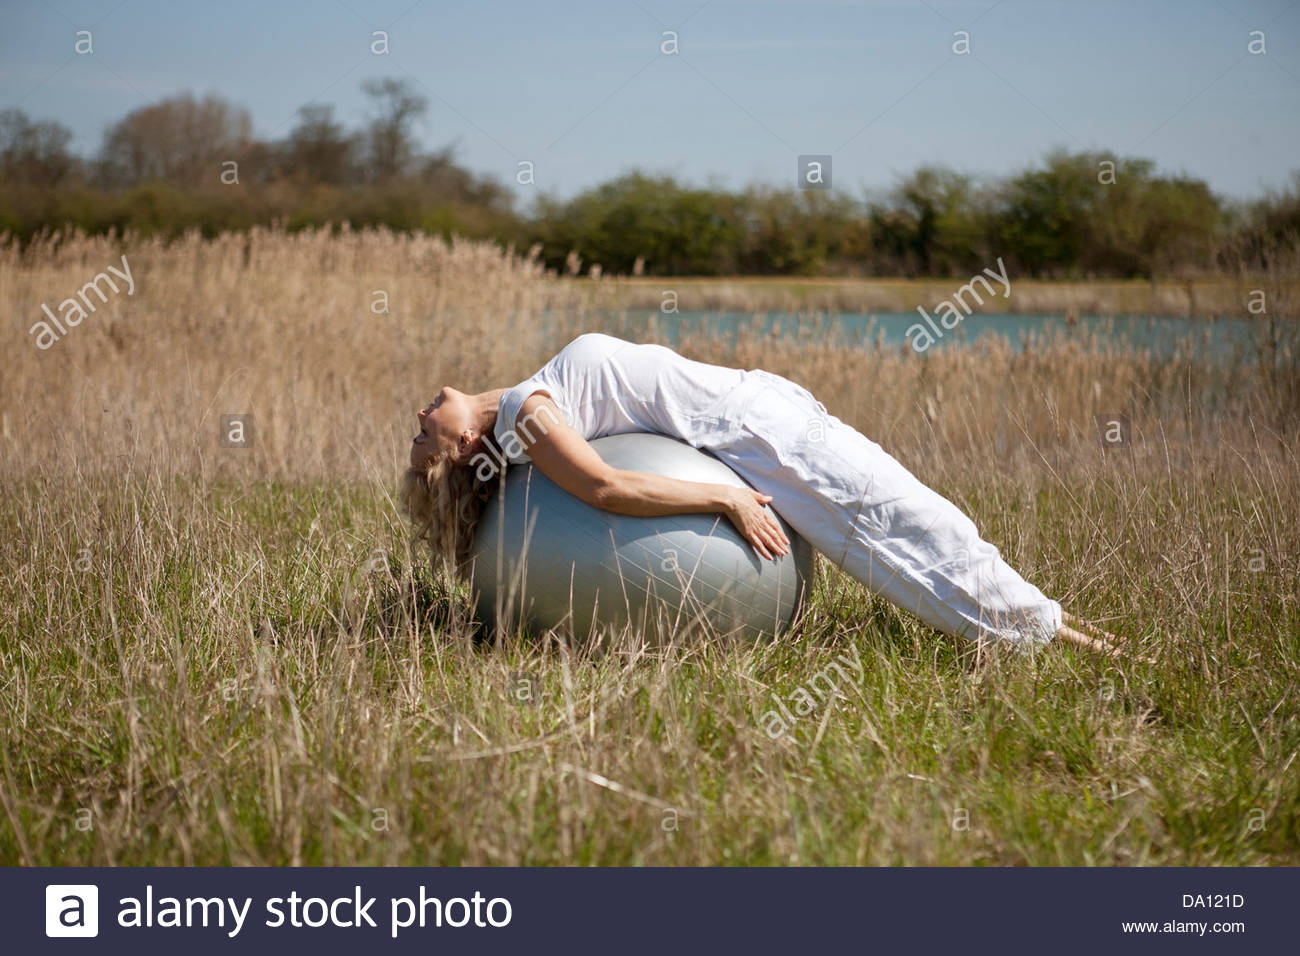 Una donna matura stretching su una palla ginnica Immagini Stock